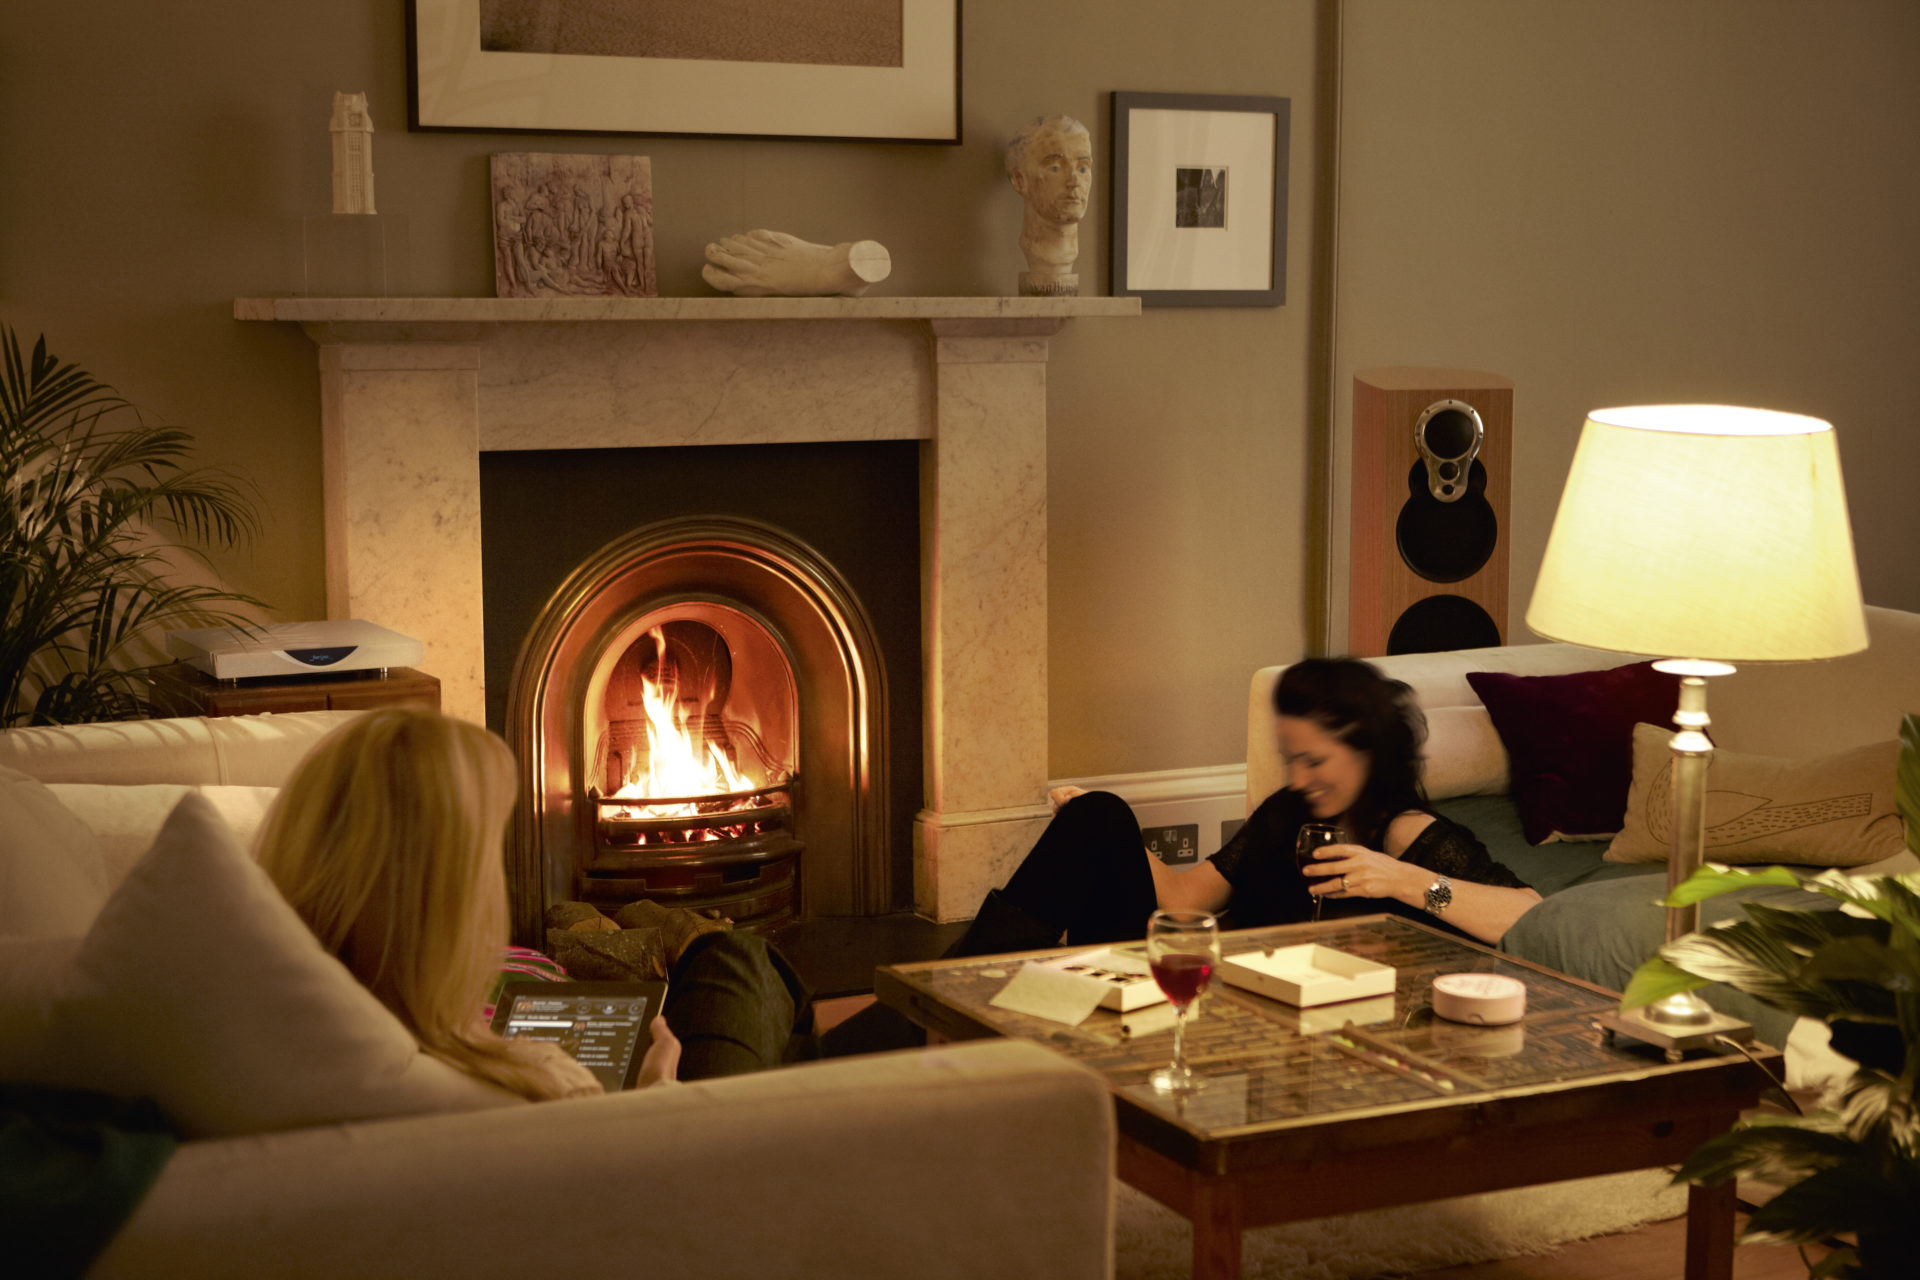 linn home bern digital music streaming home cinema macrec gmbh. Black Bedroom Furniture Sets. Home Design Ideas